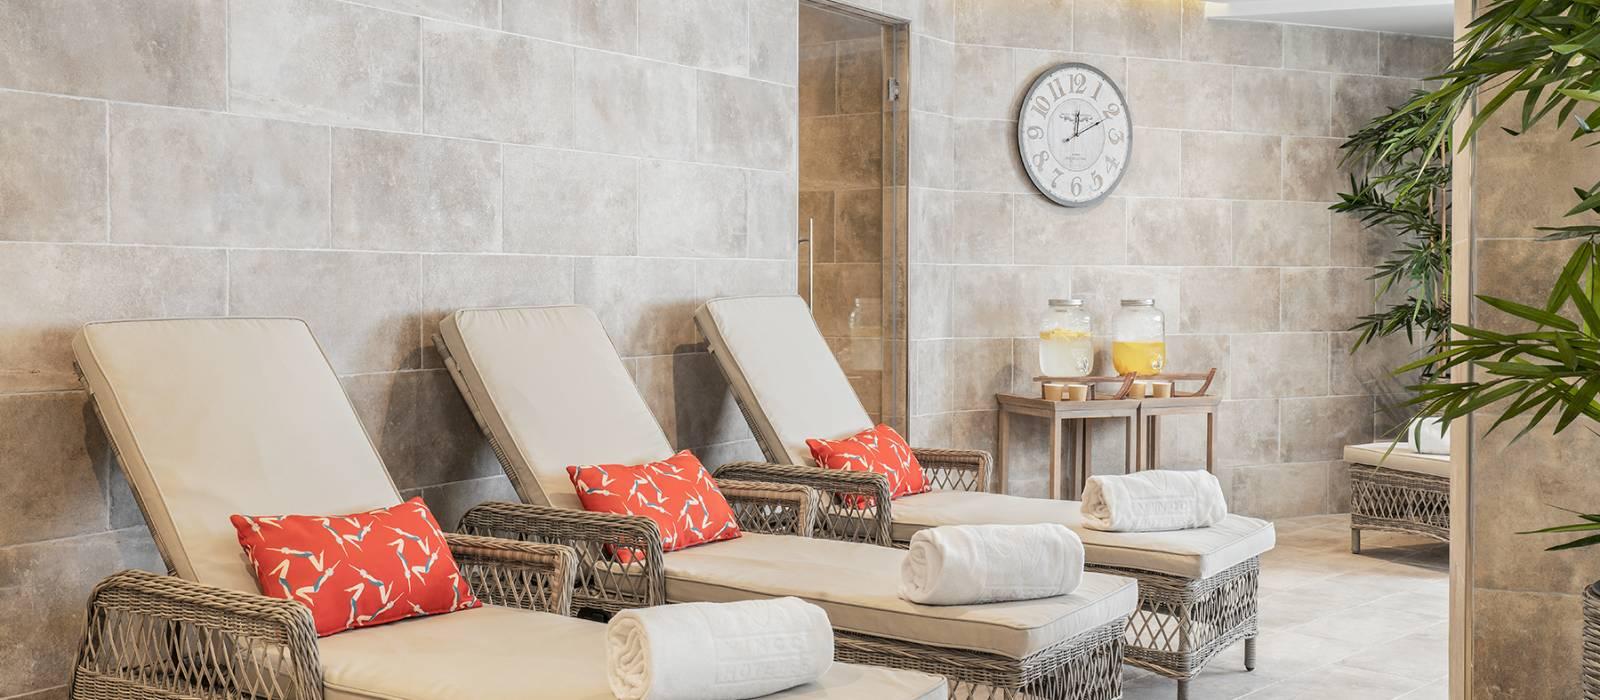 Servicios Hotel Sierra Nevada Rumaykiyya - Vincci Hoteles - Spa